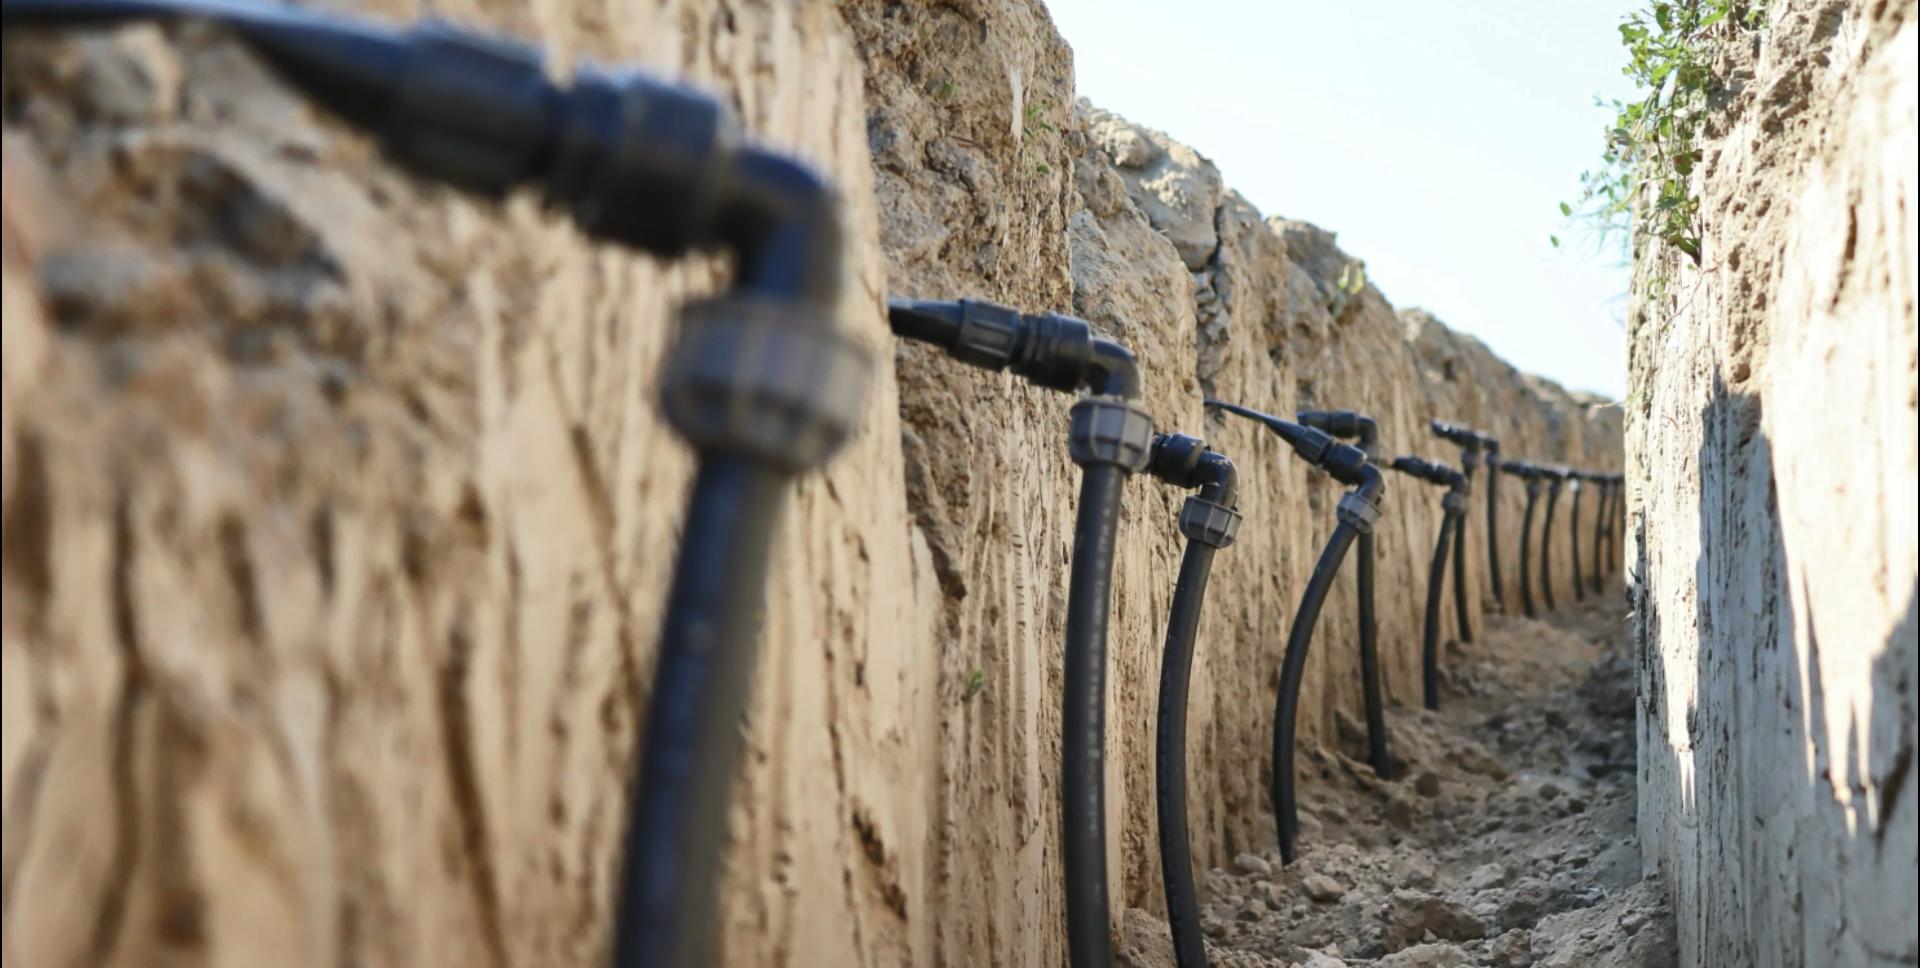 Sub-Irrigazione